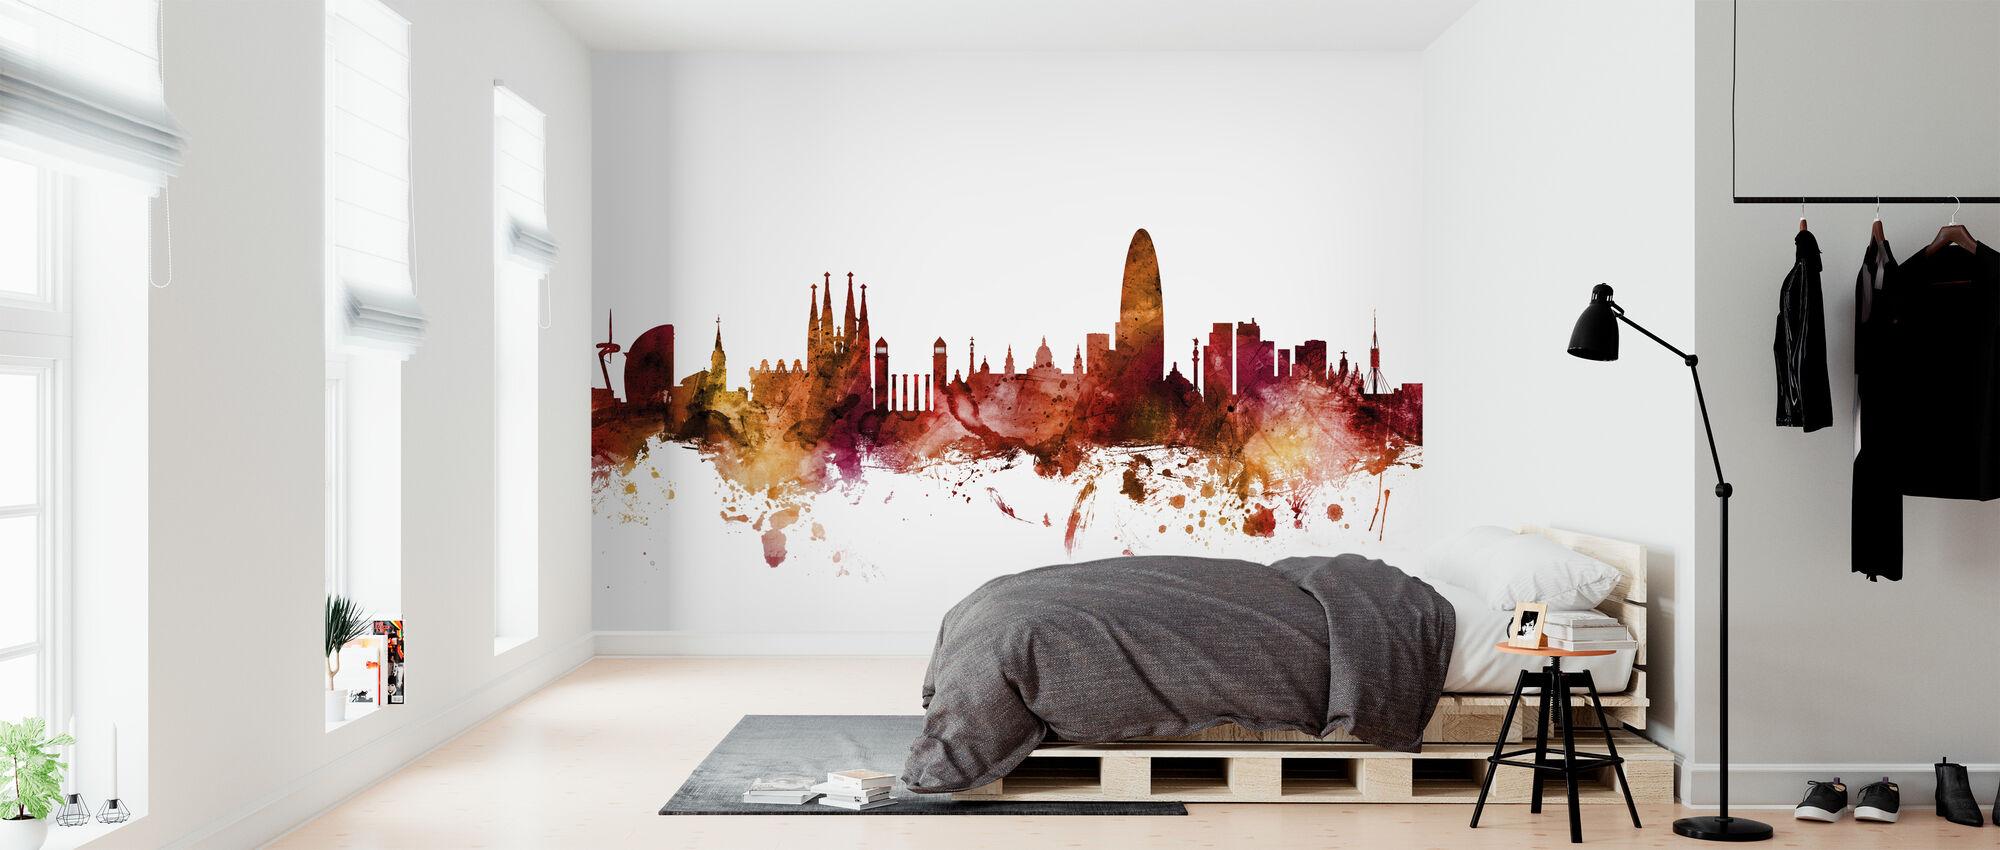 Barcelona Spain Skyline - Wallpaper - Bedroom